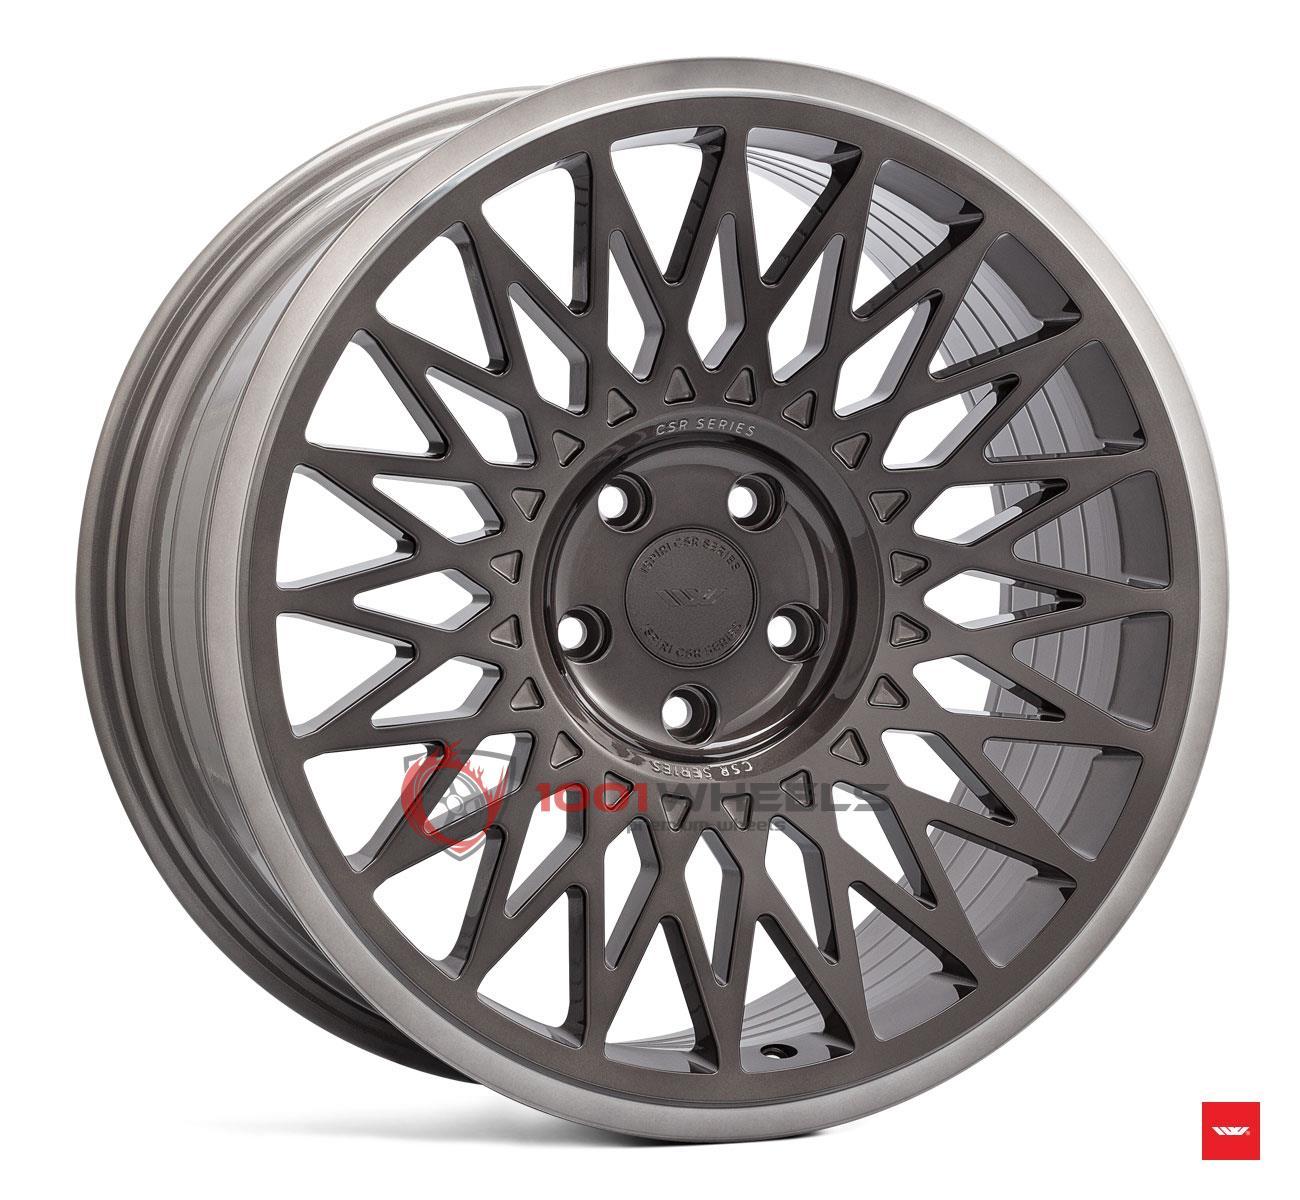 ISPIRI CSR-FF4 carbon-grey-brushed